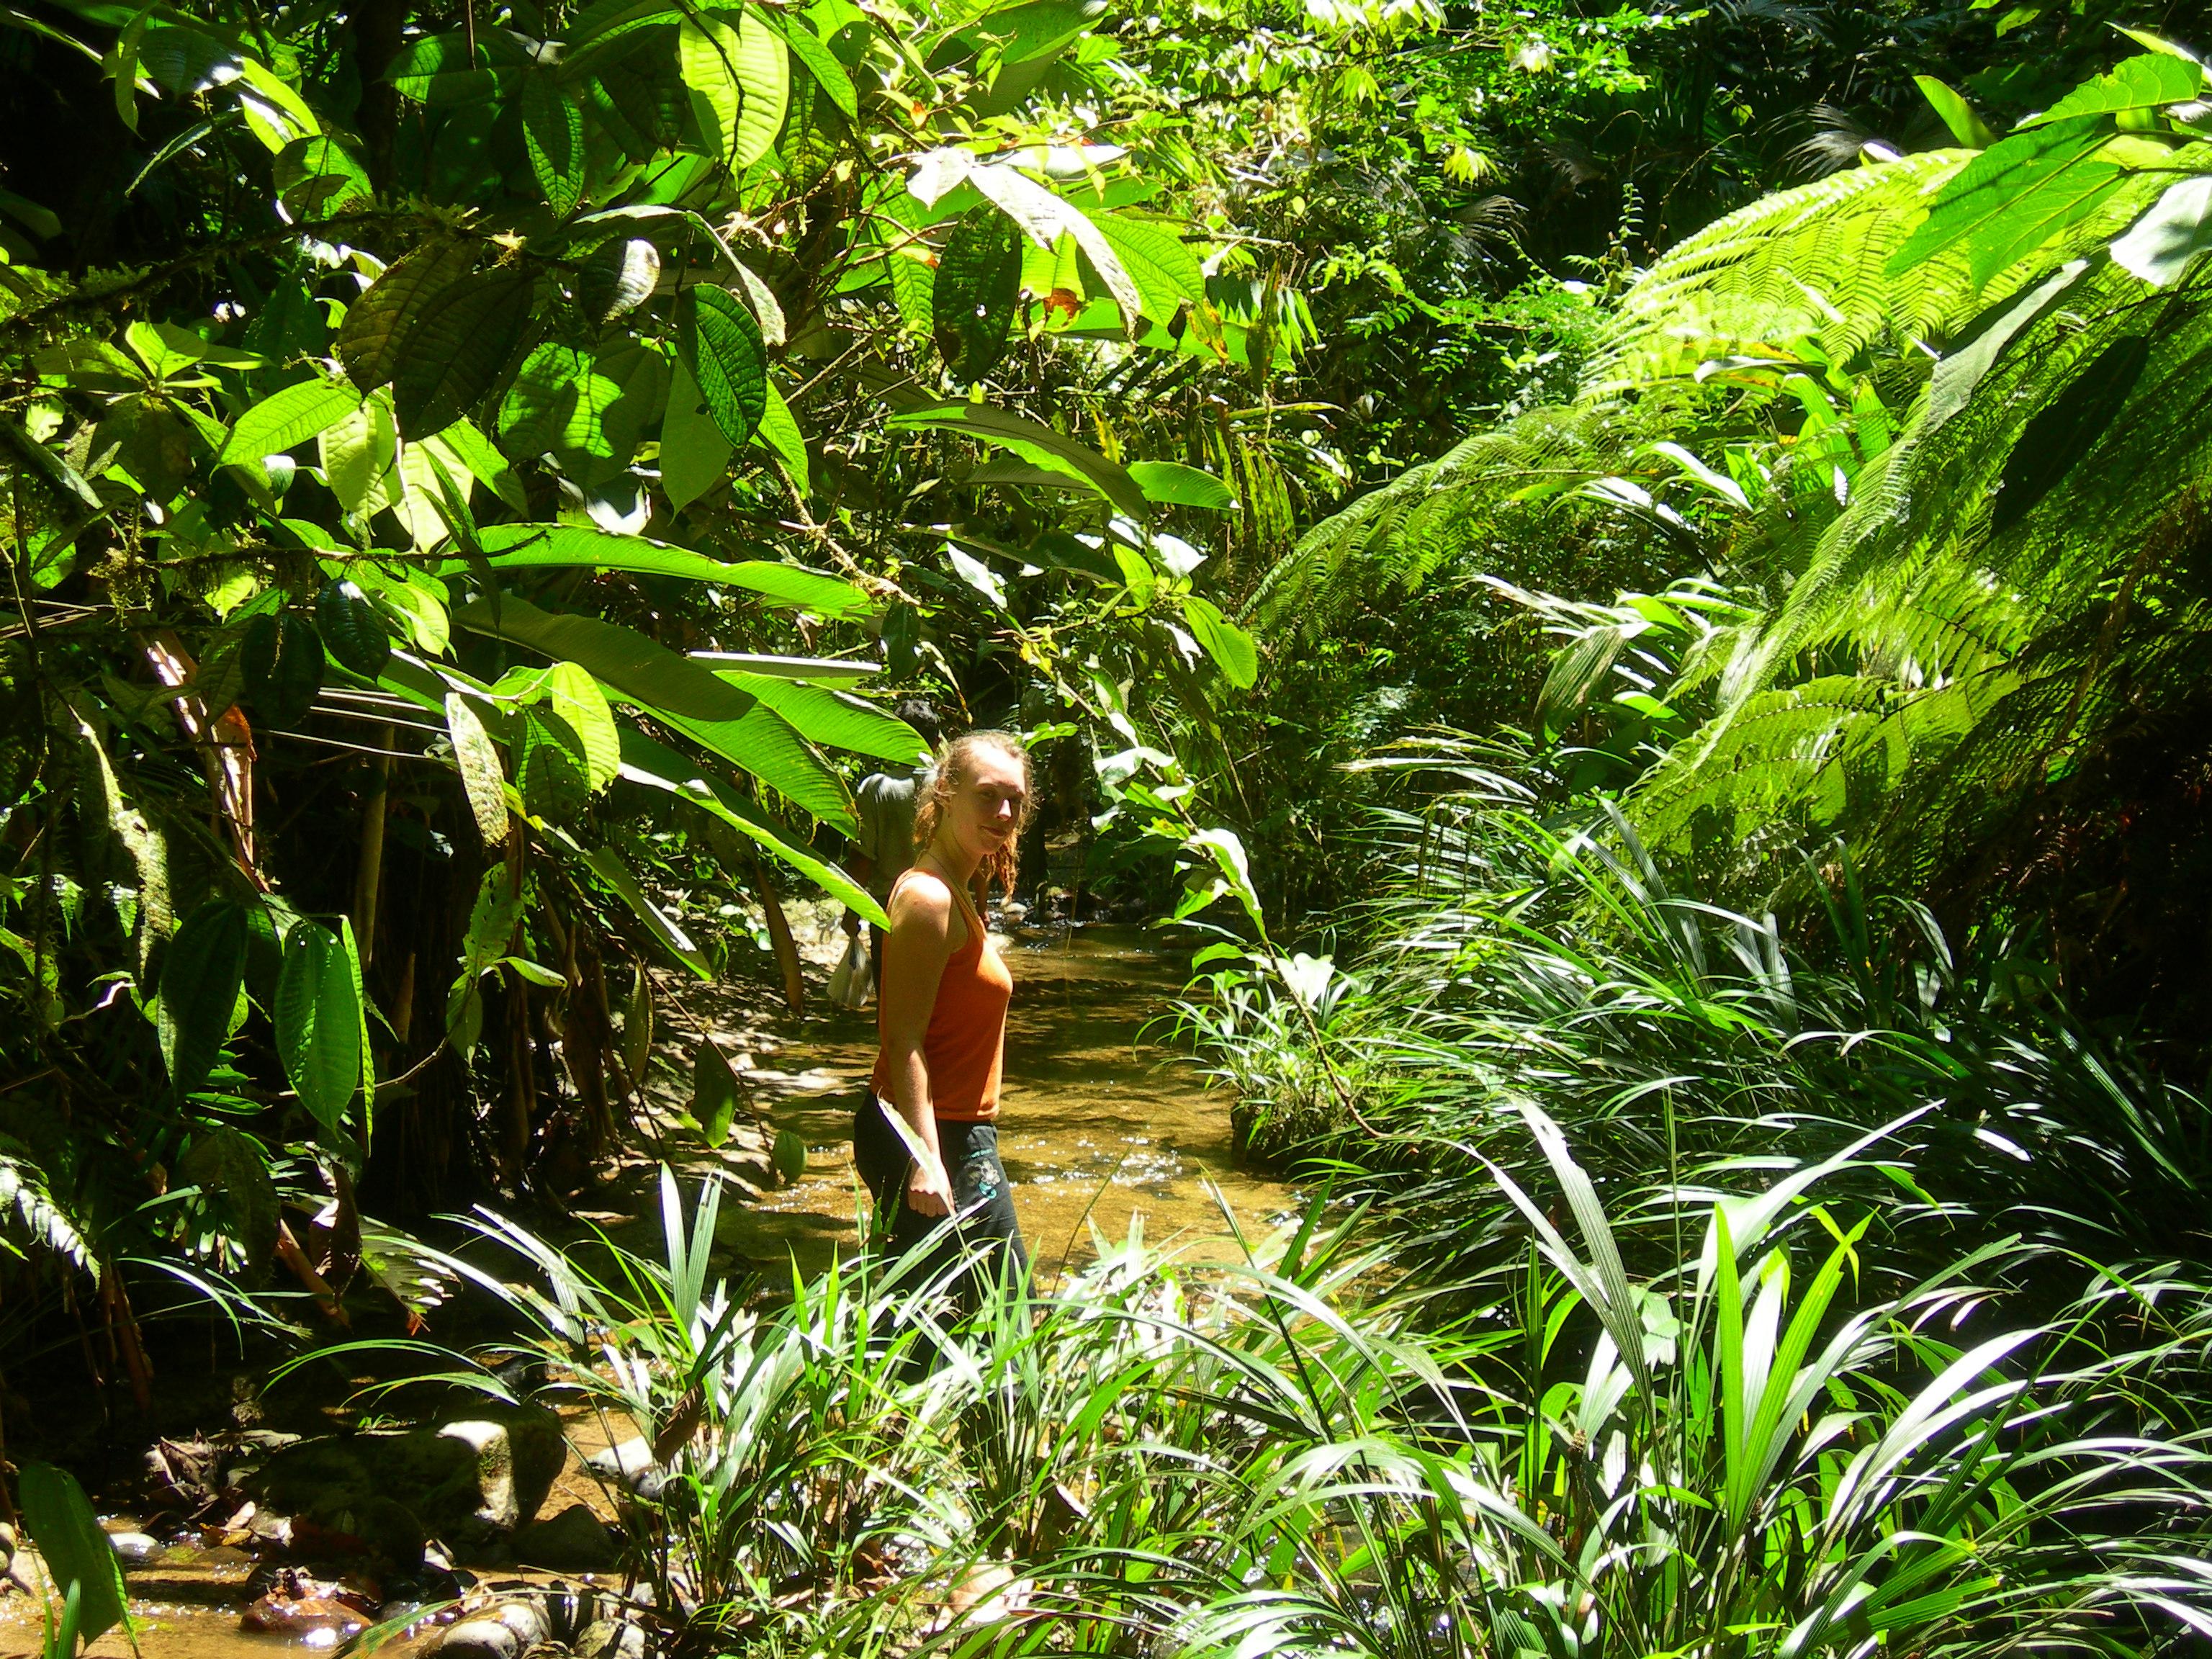 Adieu amazoonico at les babos dans la jungle - Animal qui mange les fourmis ...